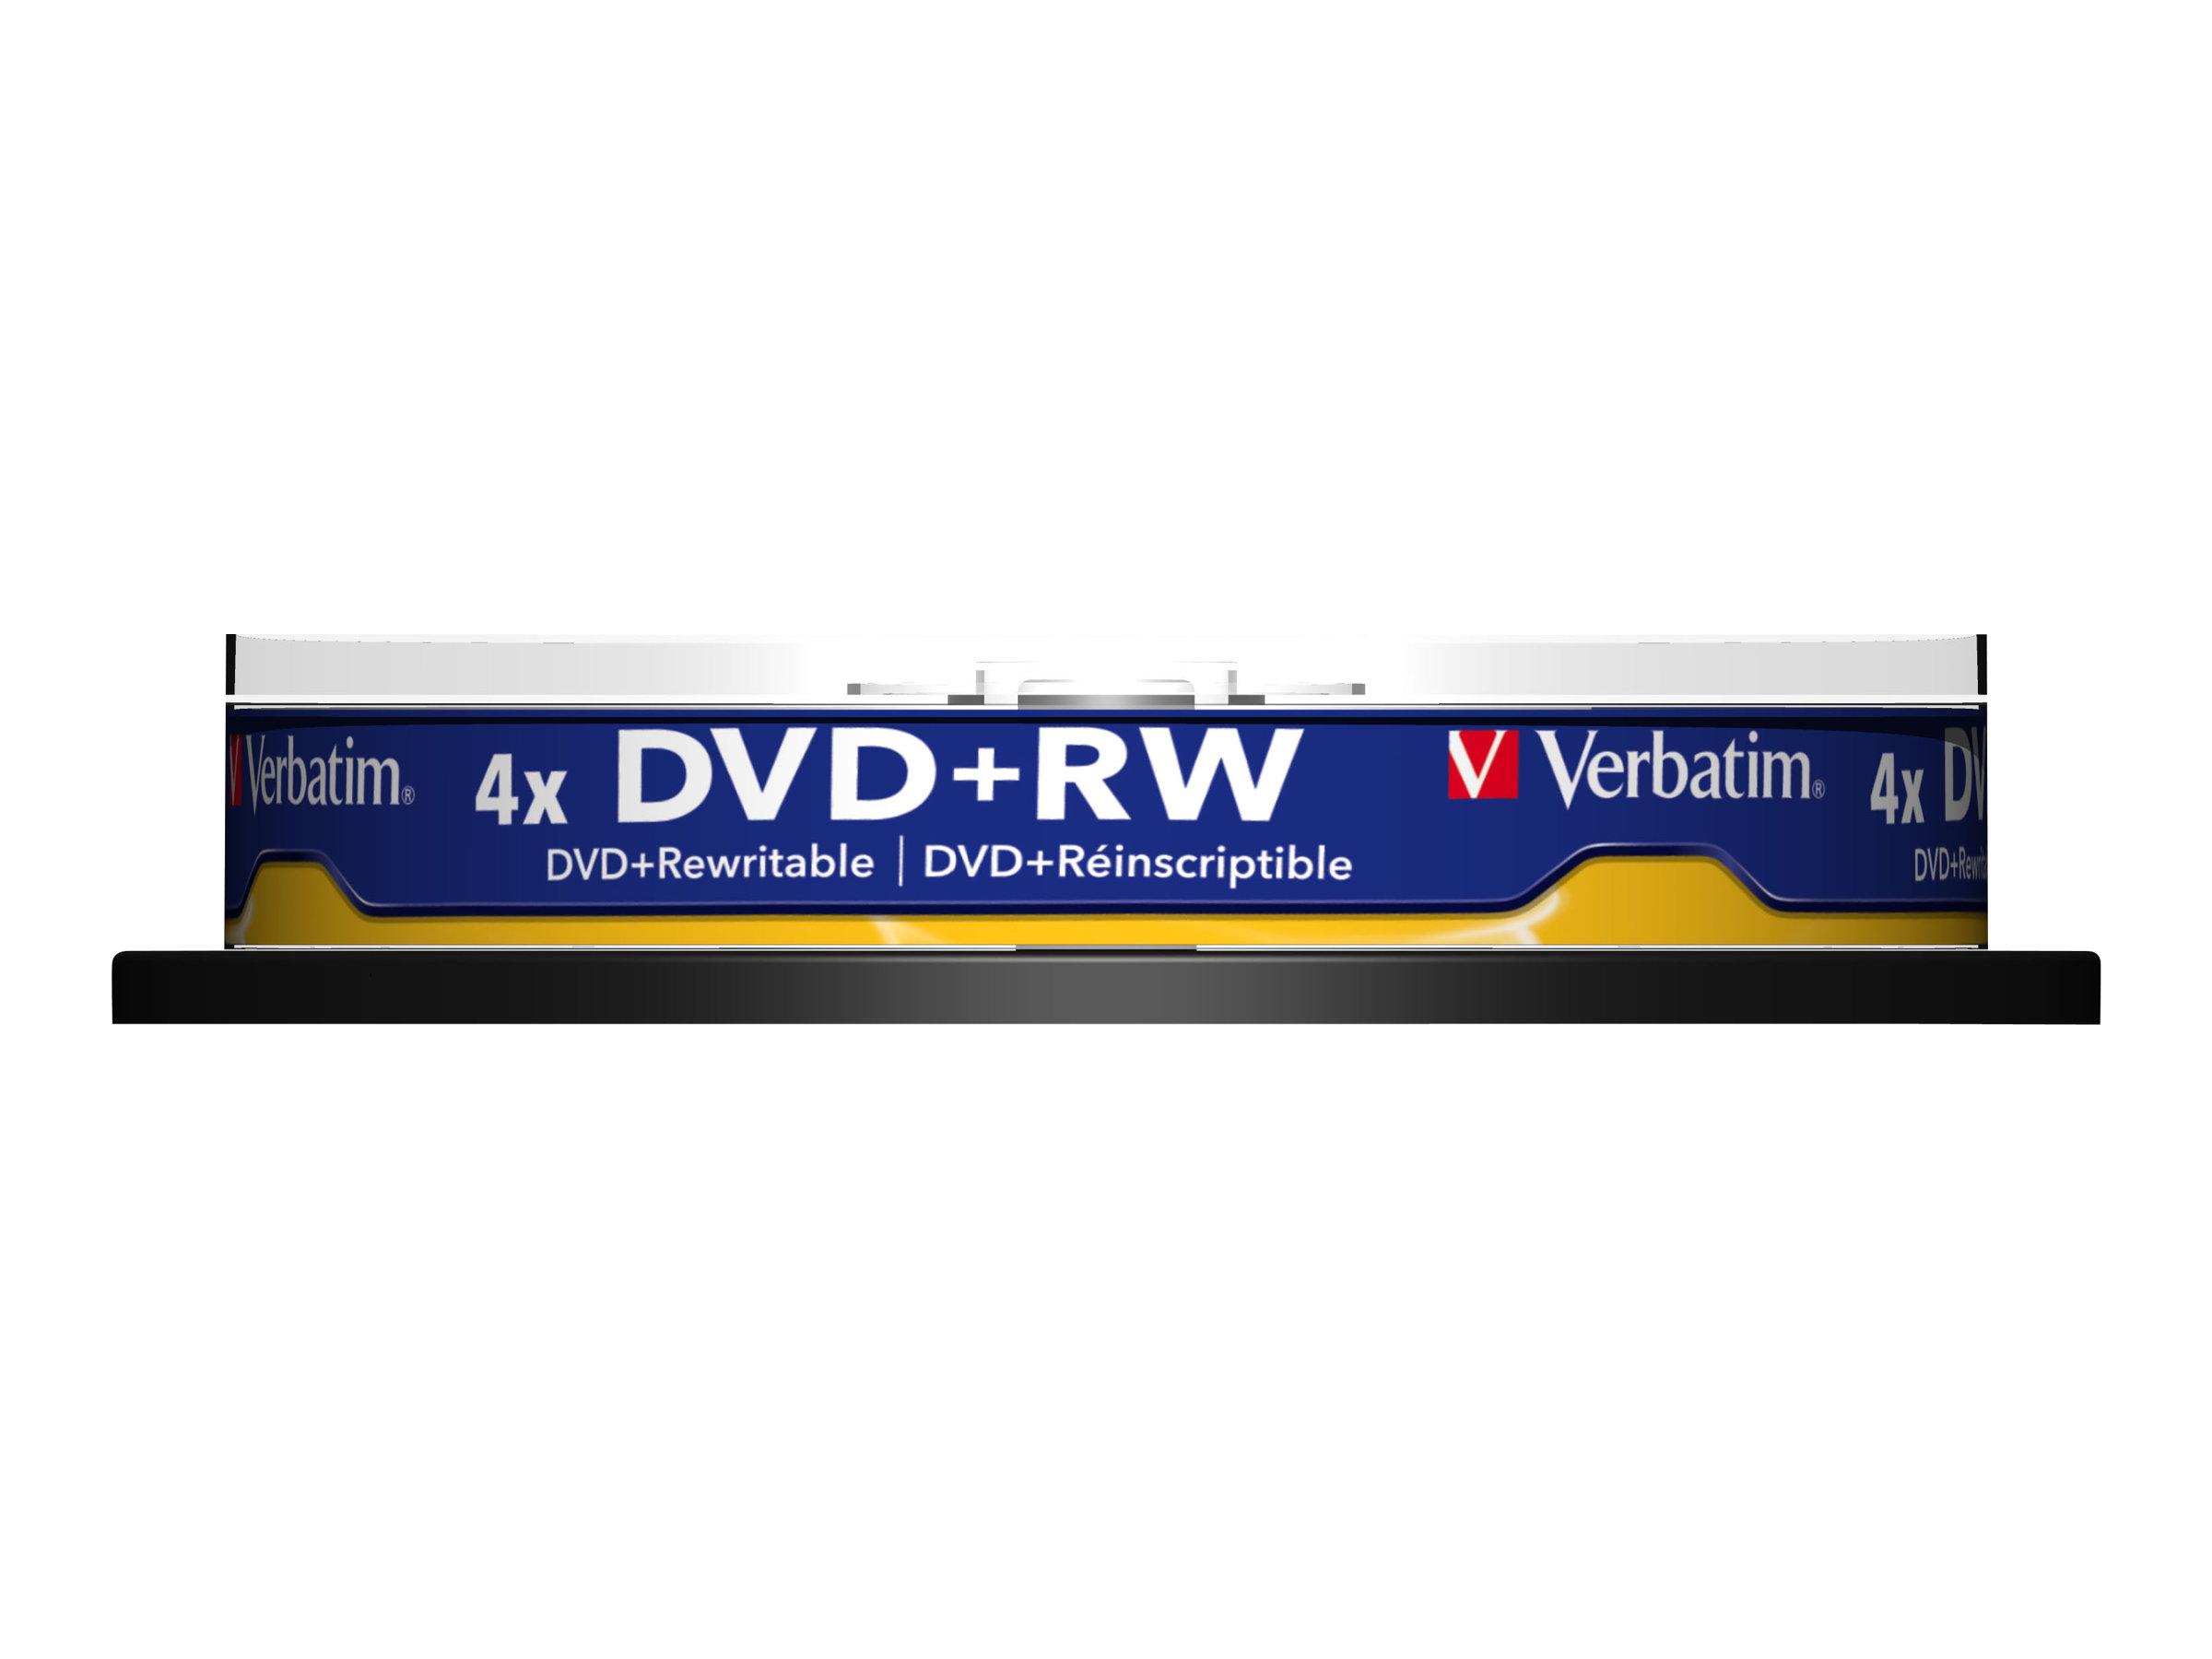 Verbatim 10 x DVD+RW - 4.7 GB (120 Min.) 4x